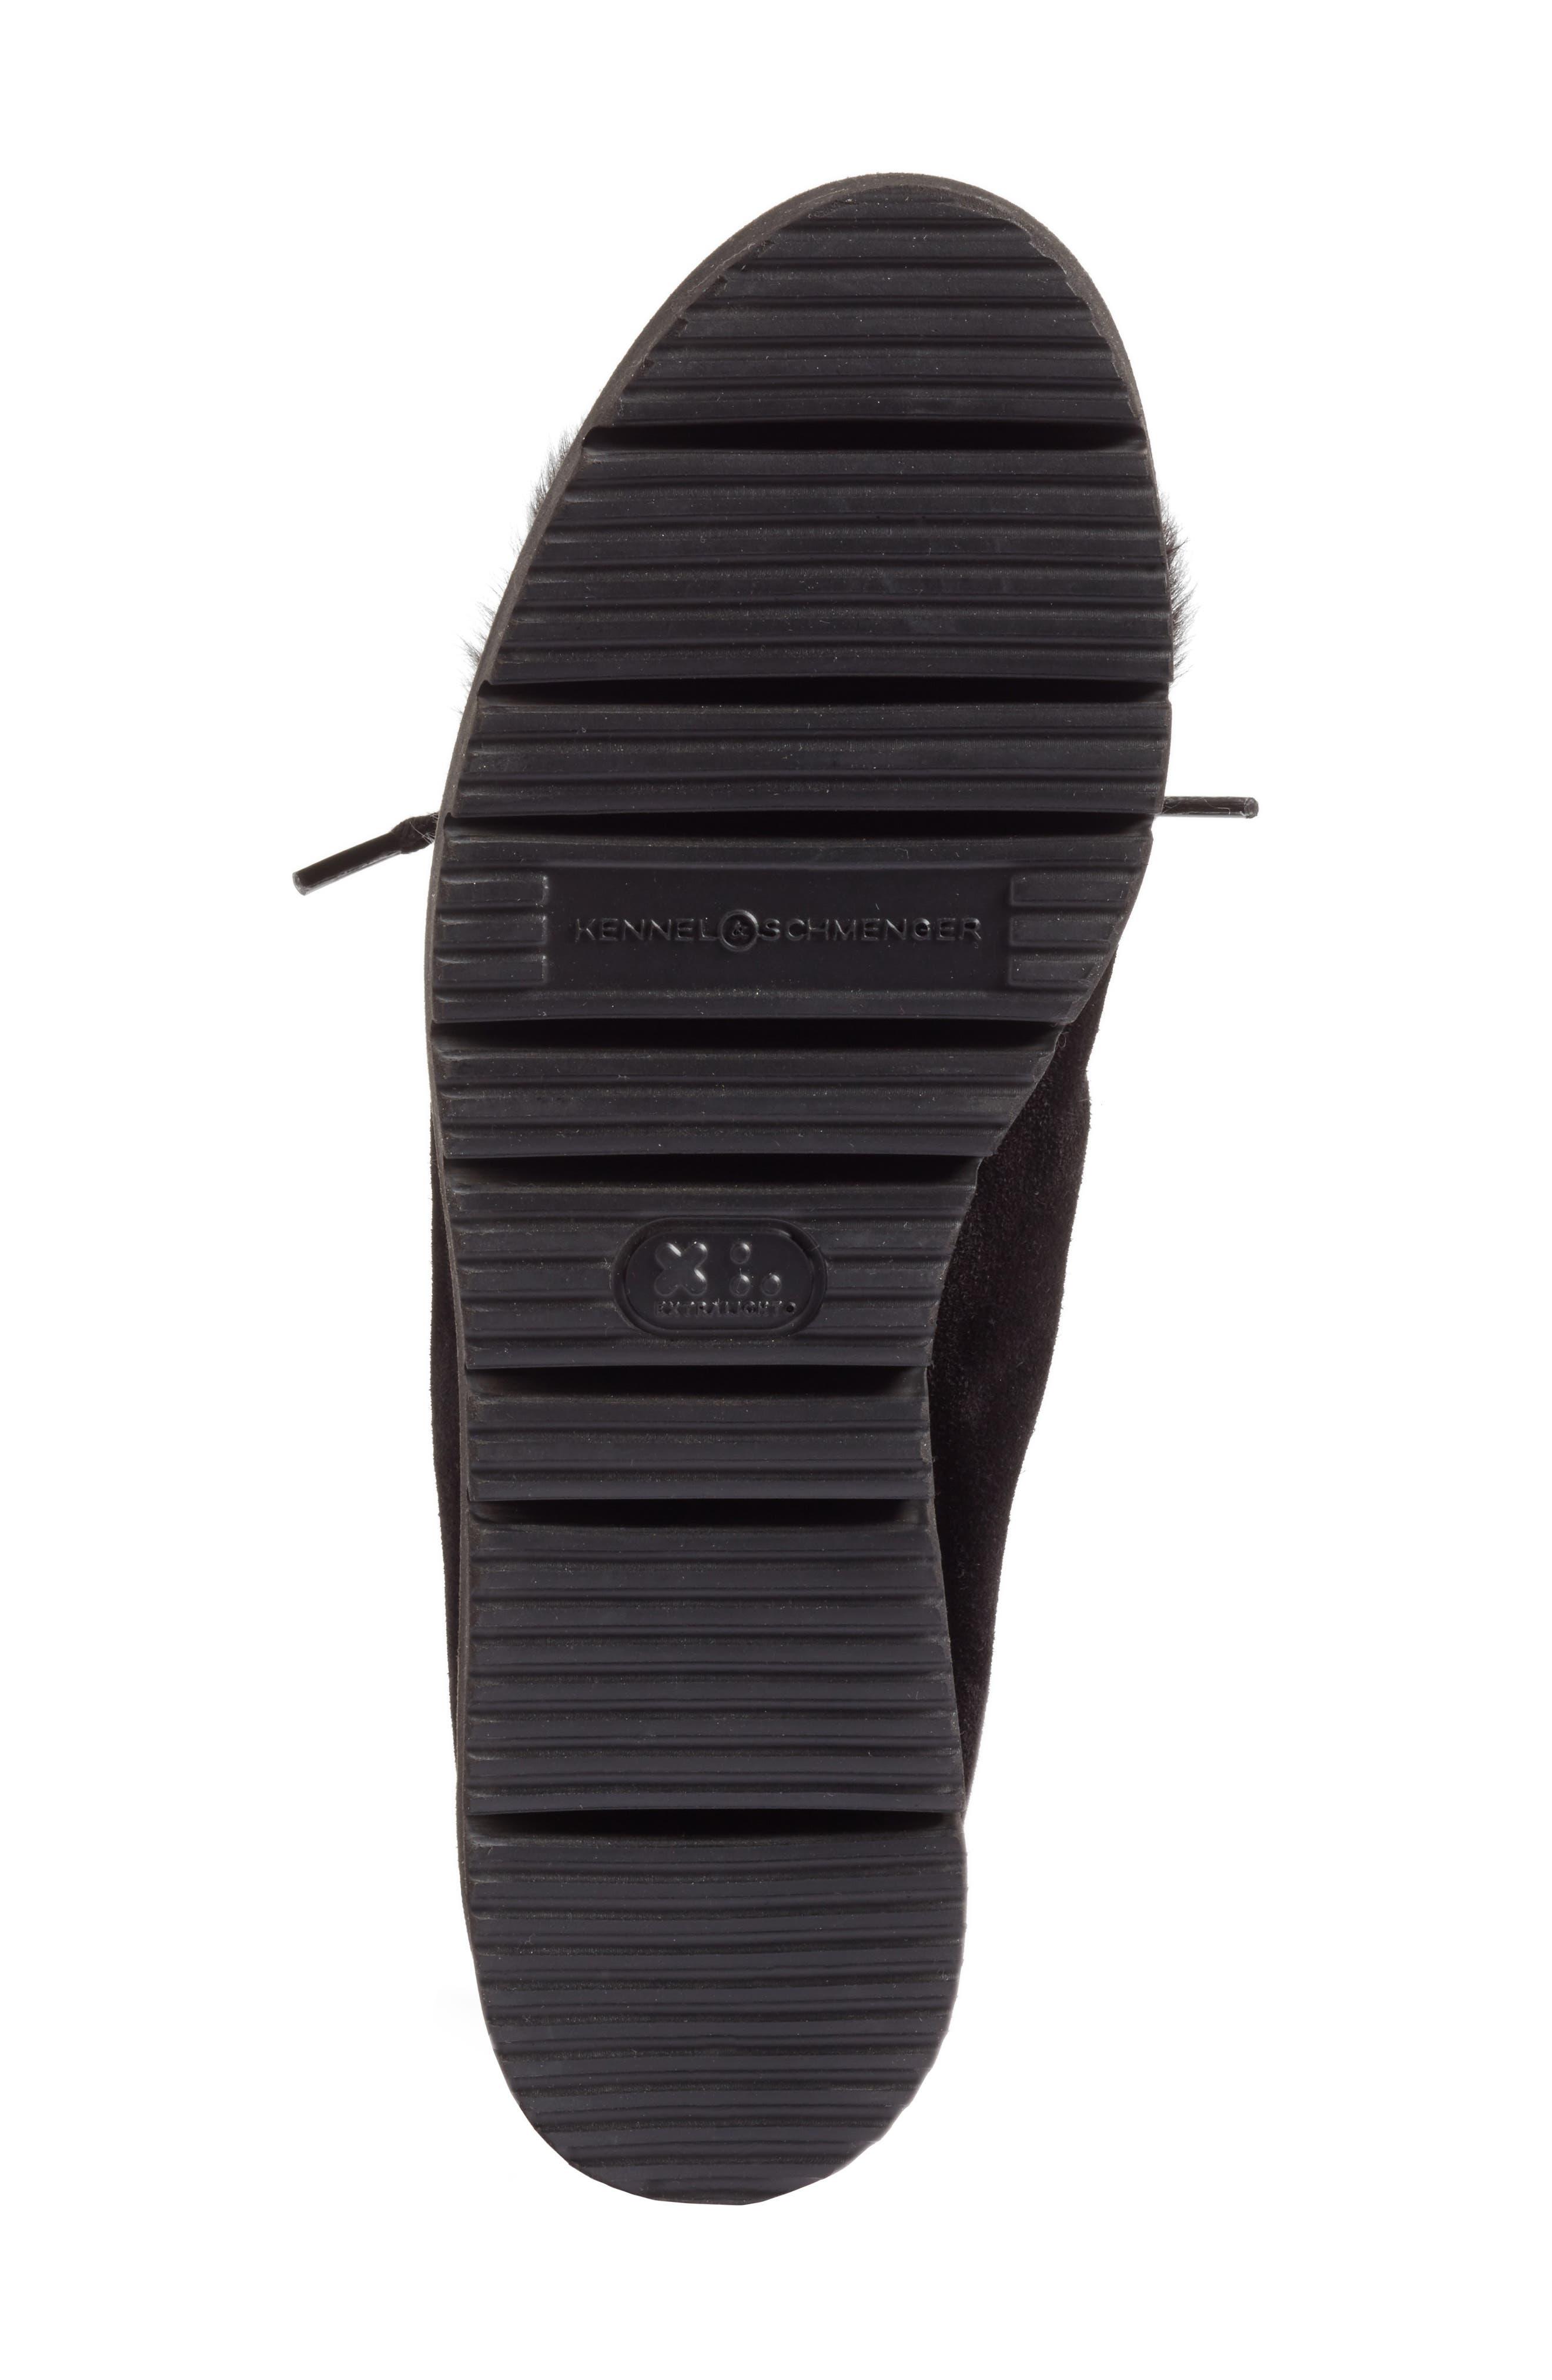 Kennel & Schmenger Malu Suede & Genuine Shearling Slip-On Sneaker,                             Alternate thumbnail 6, color,                             001